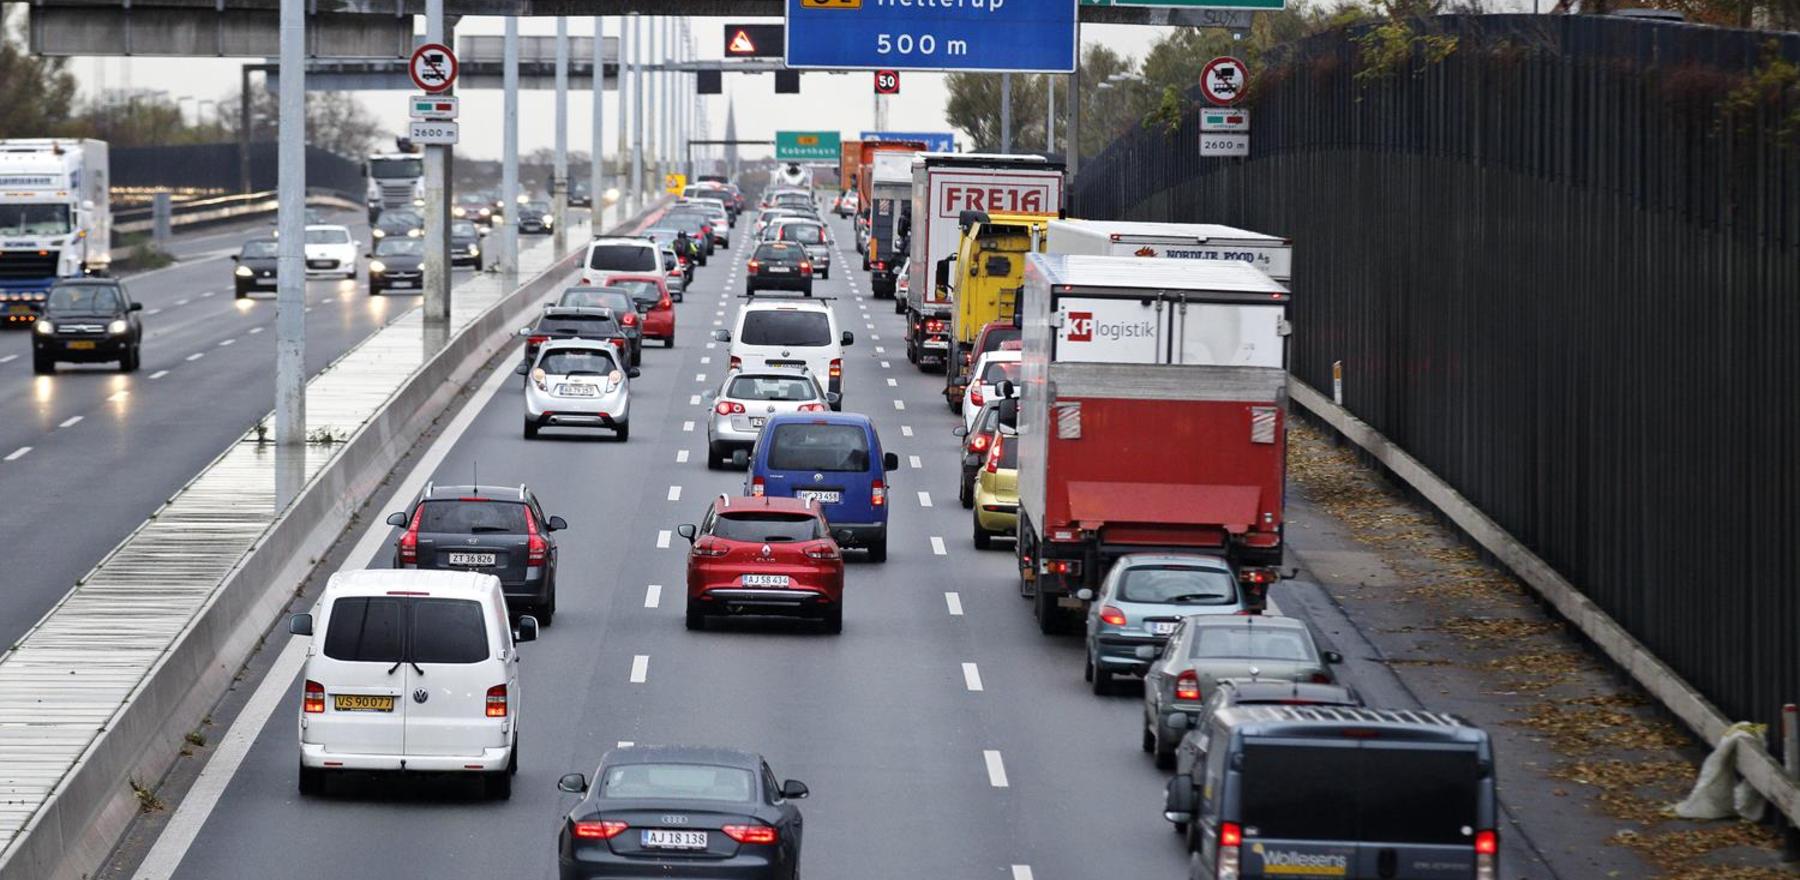 The Danish Road Directorate (Vejdirektoratet)